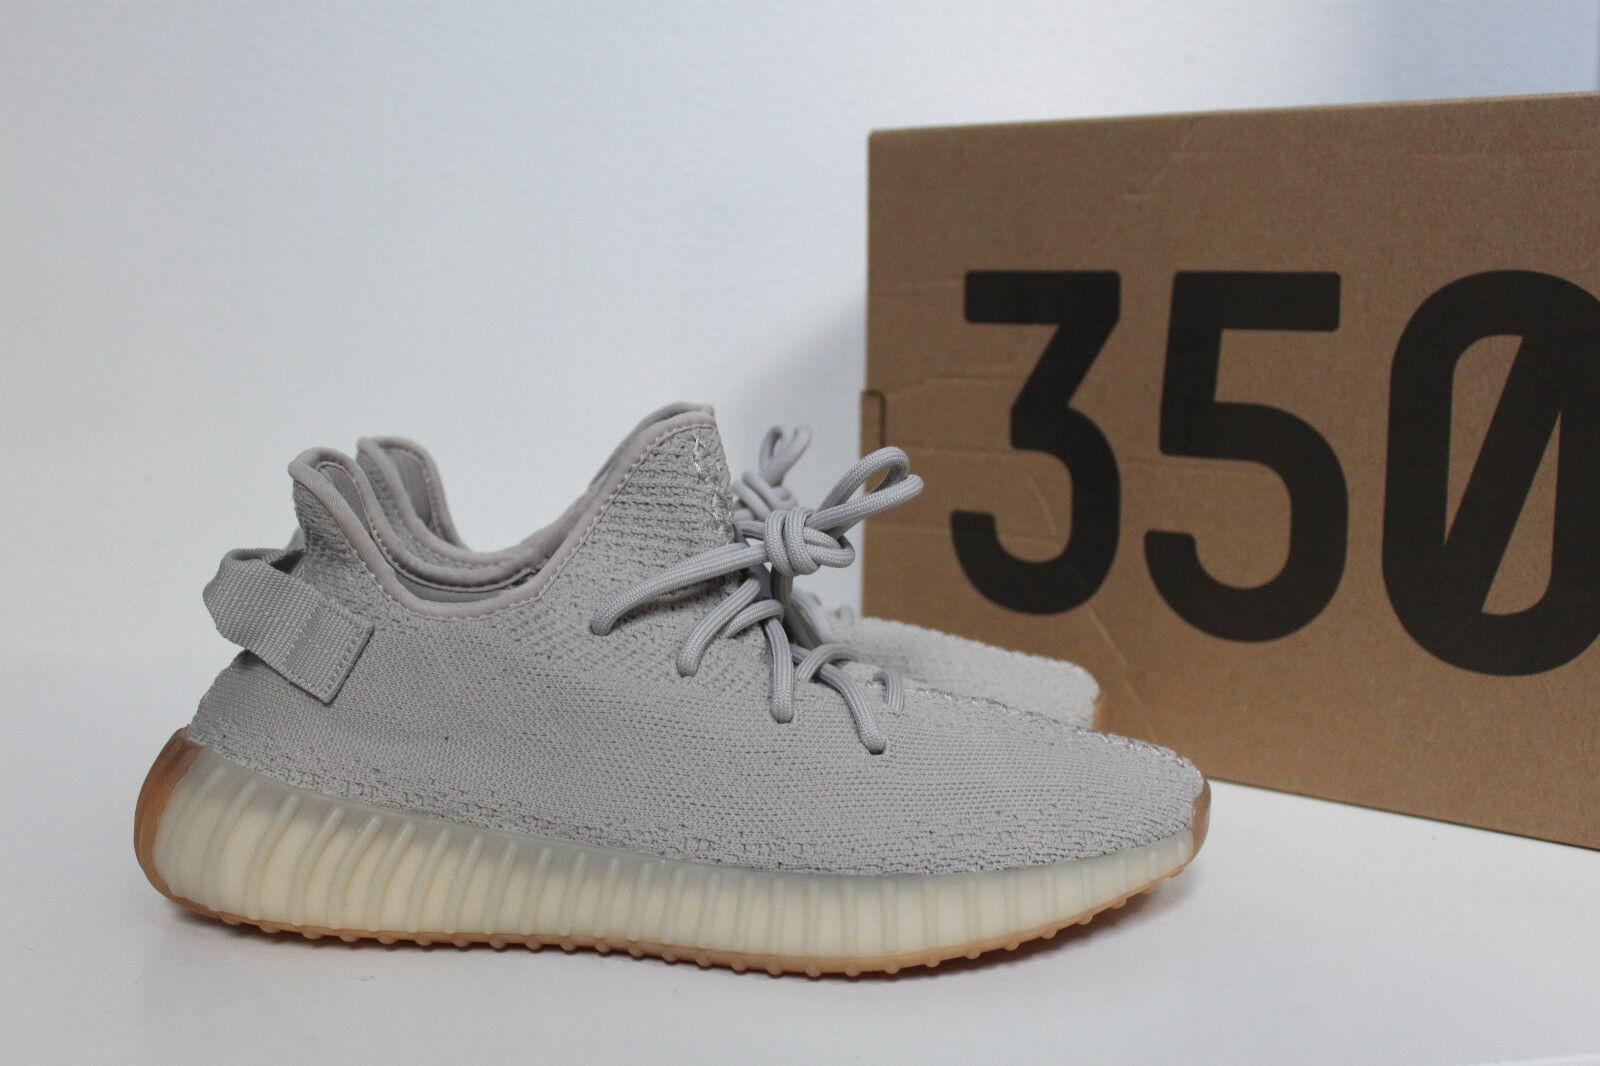 Sz 9.5 YEEZY Kanye Sesame Tan Yeezy Boost 350 V2 Mens Sneaker shoes Authentic